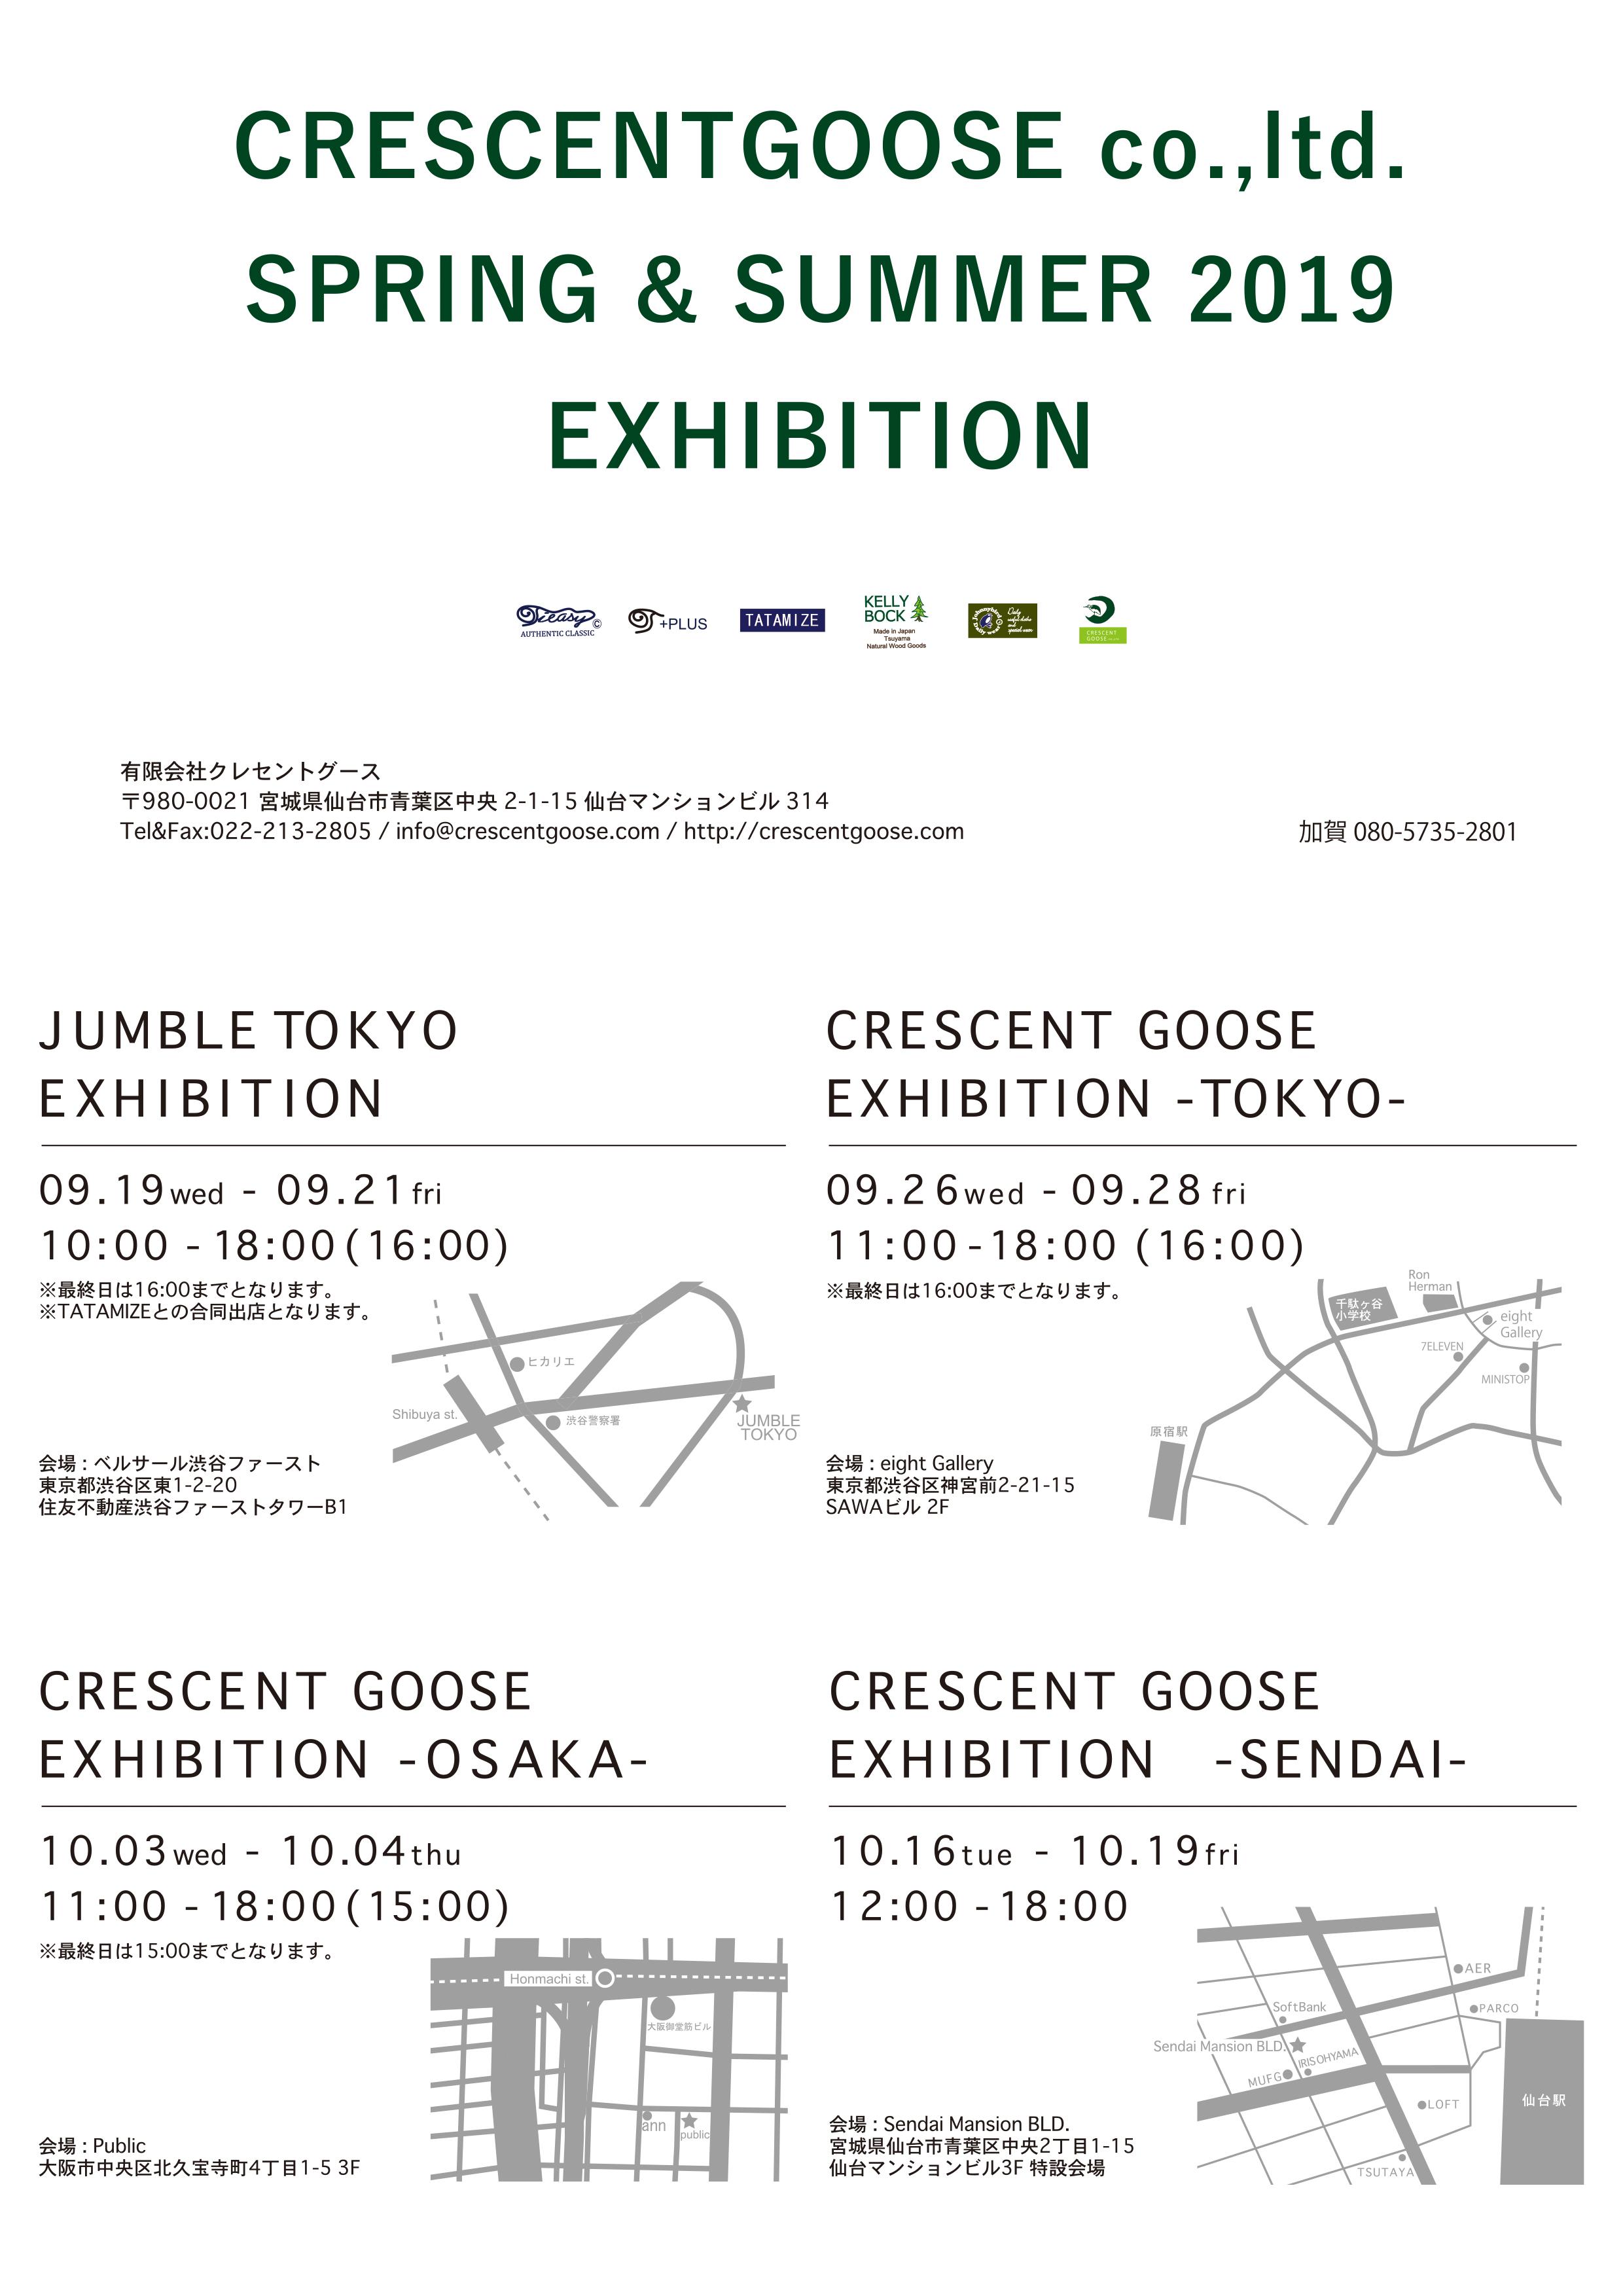 exibition